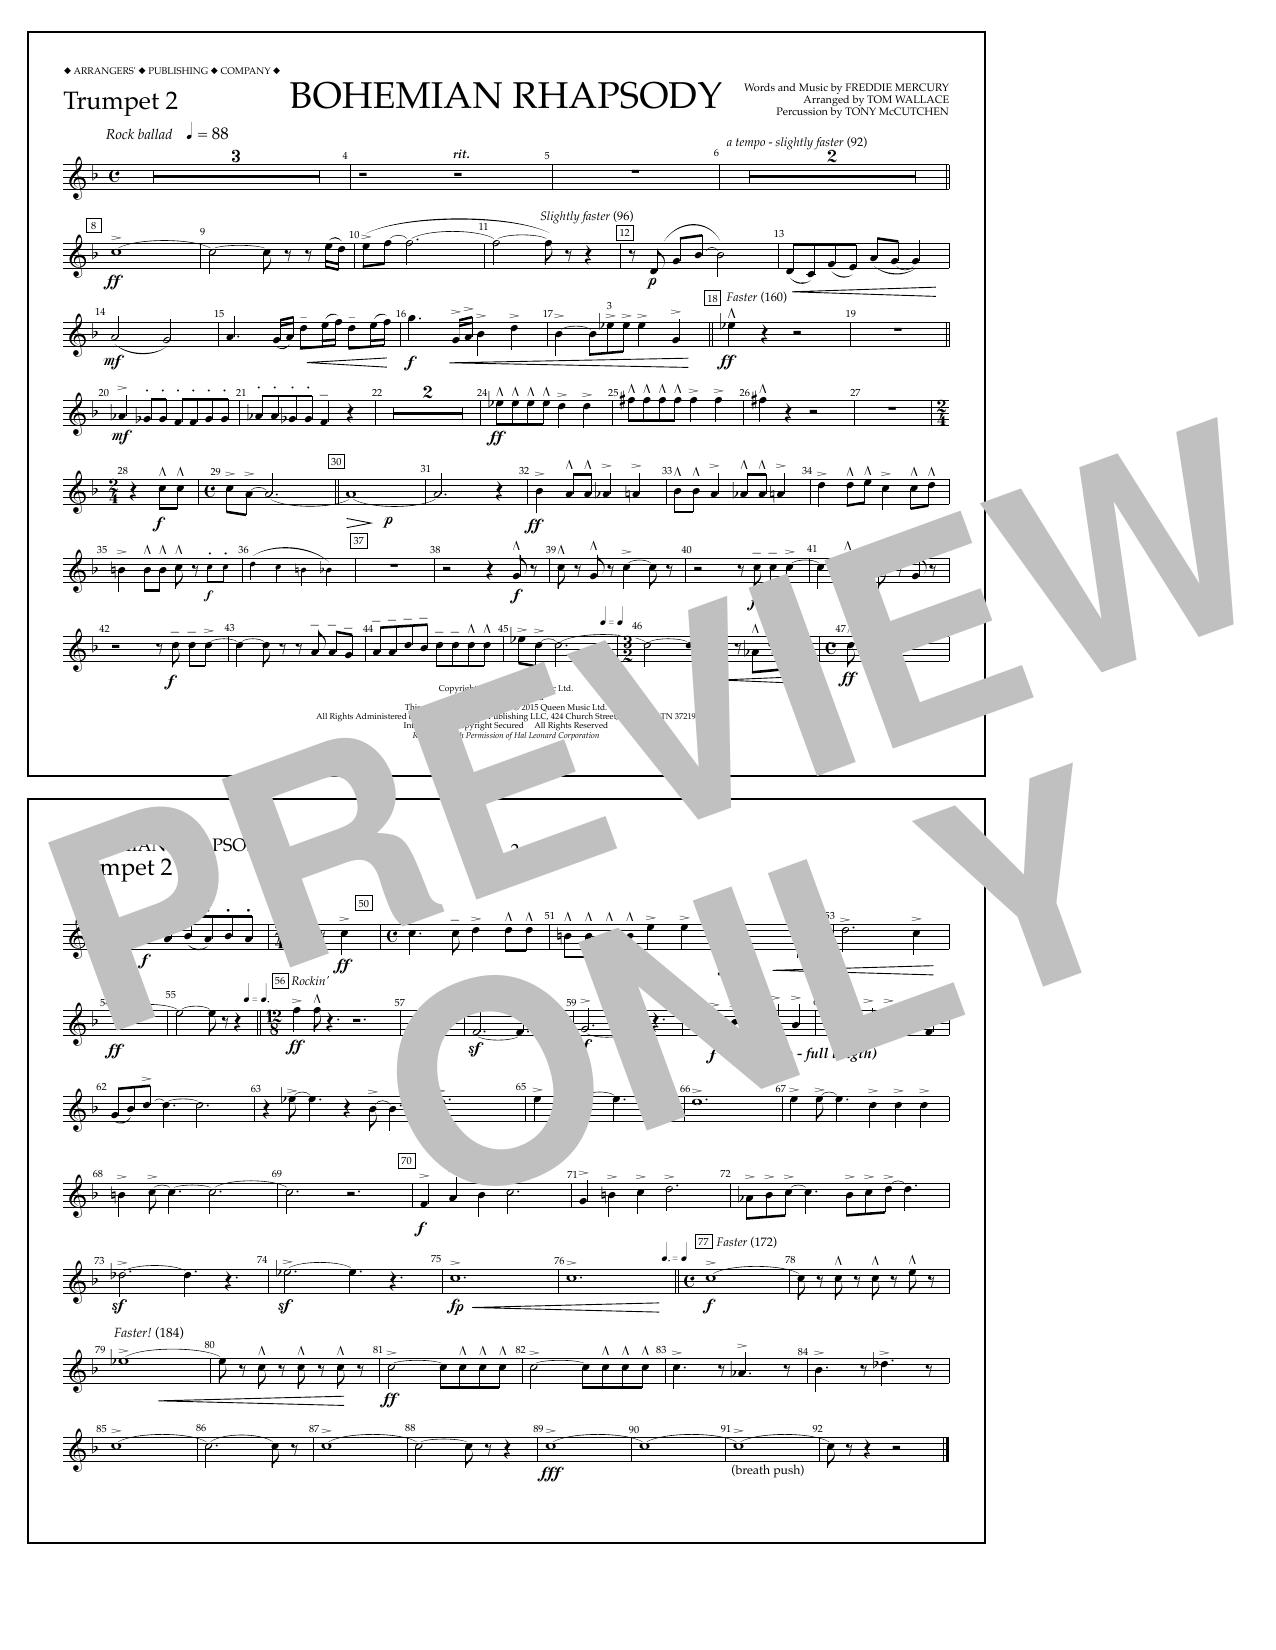 Bohemian Rhapsody - Trumpet 2 Sheet Music